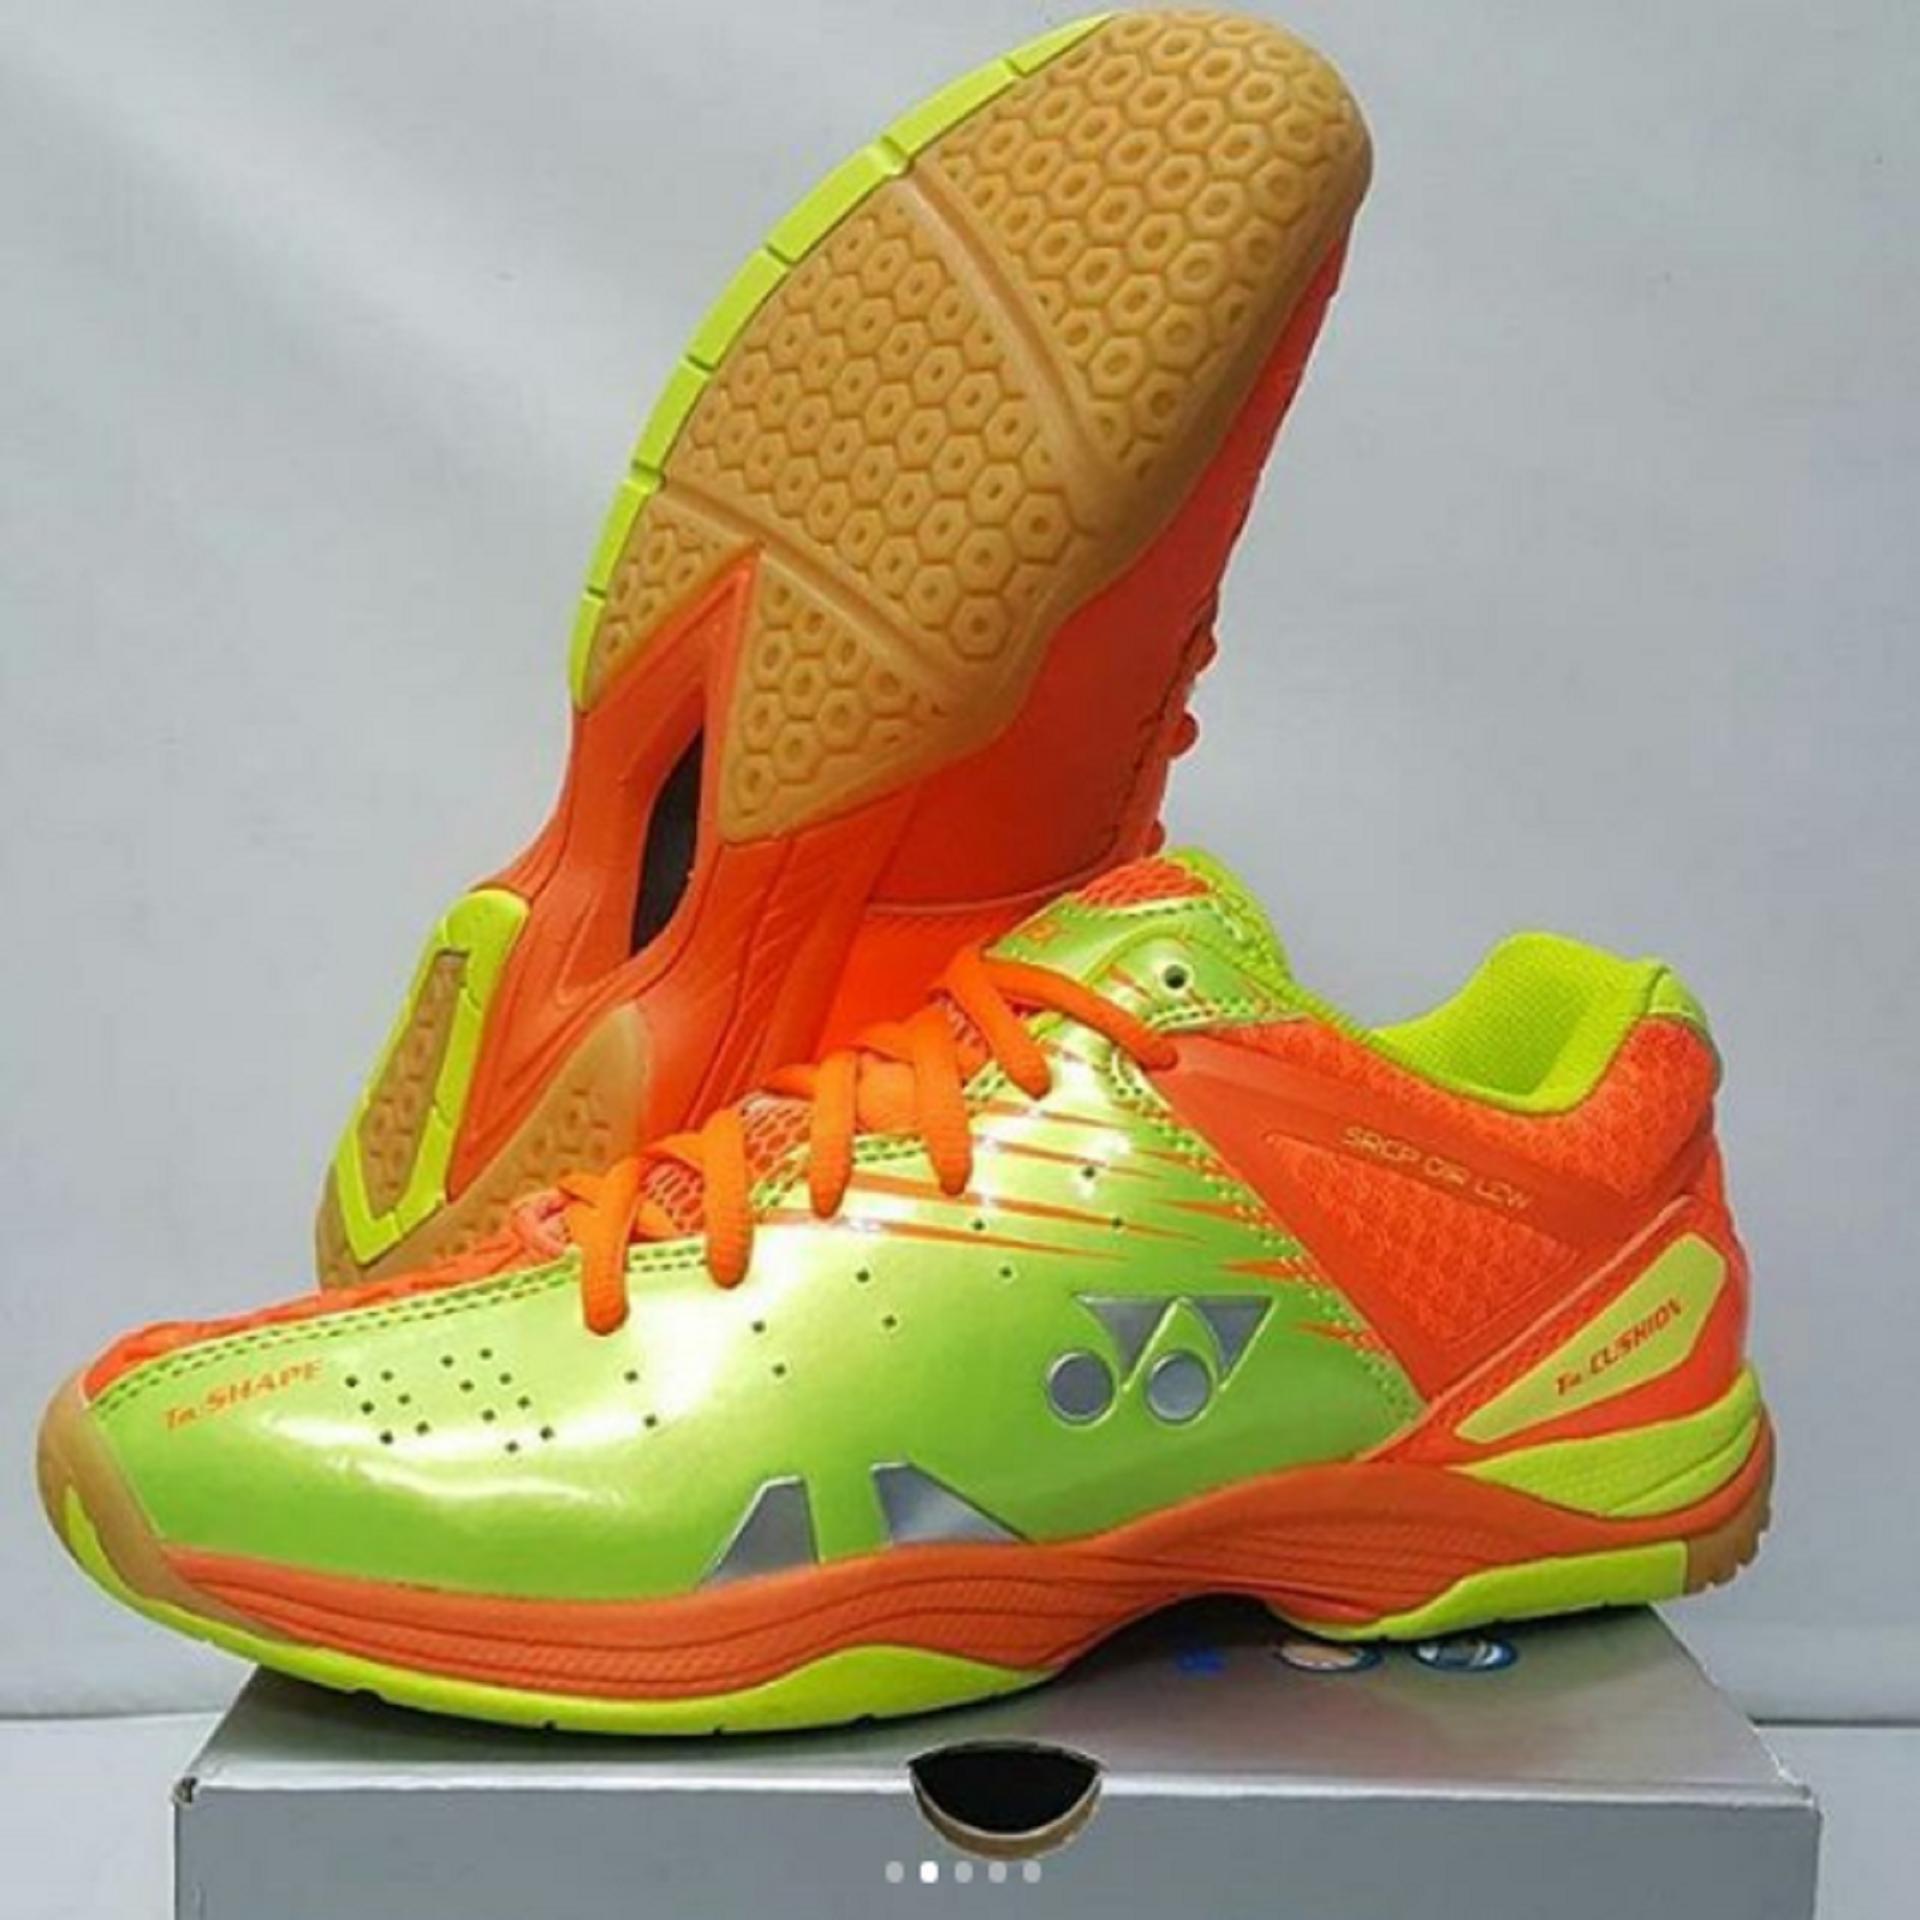 Spek Sepatu Yonex Srcp 01R Lcw Badminton Shoes Bulutangkis Adha Sport Jawa Timur